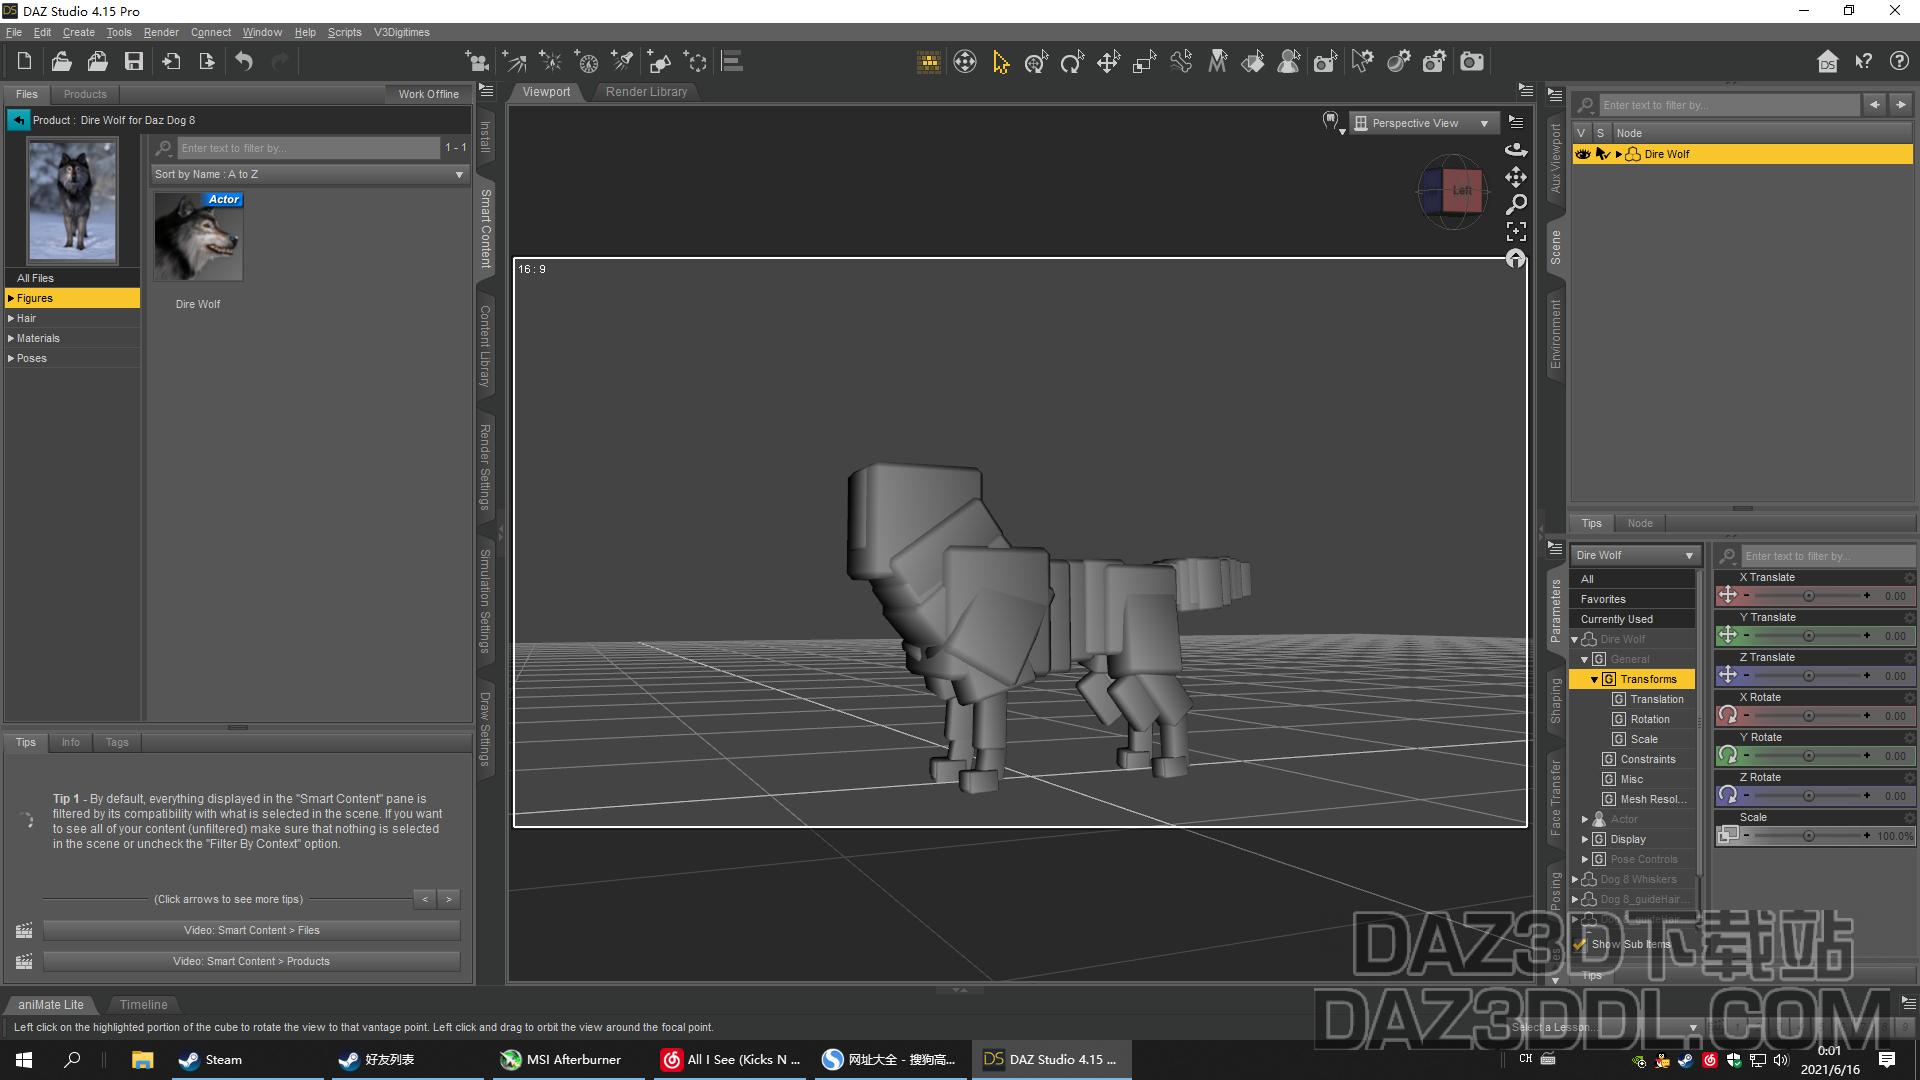 Desktop Screenshot 2021.06.16 - 00.01.49.85.png